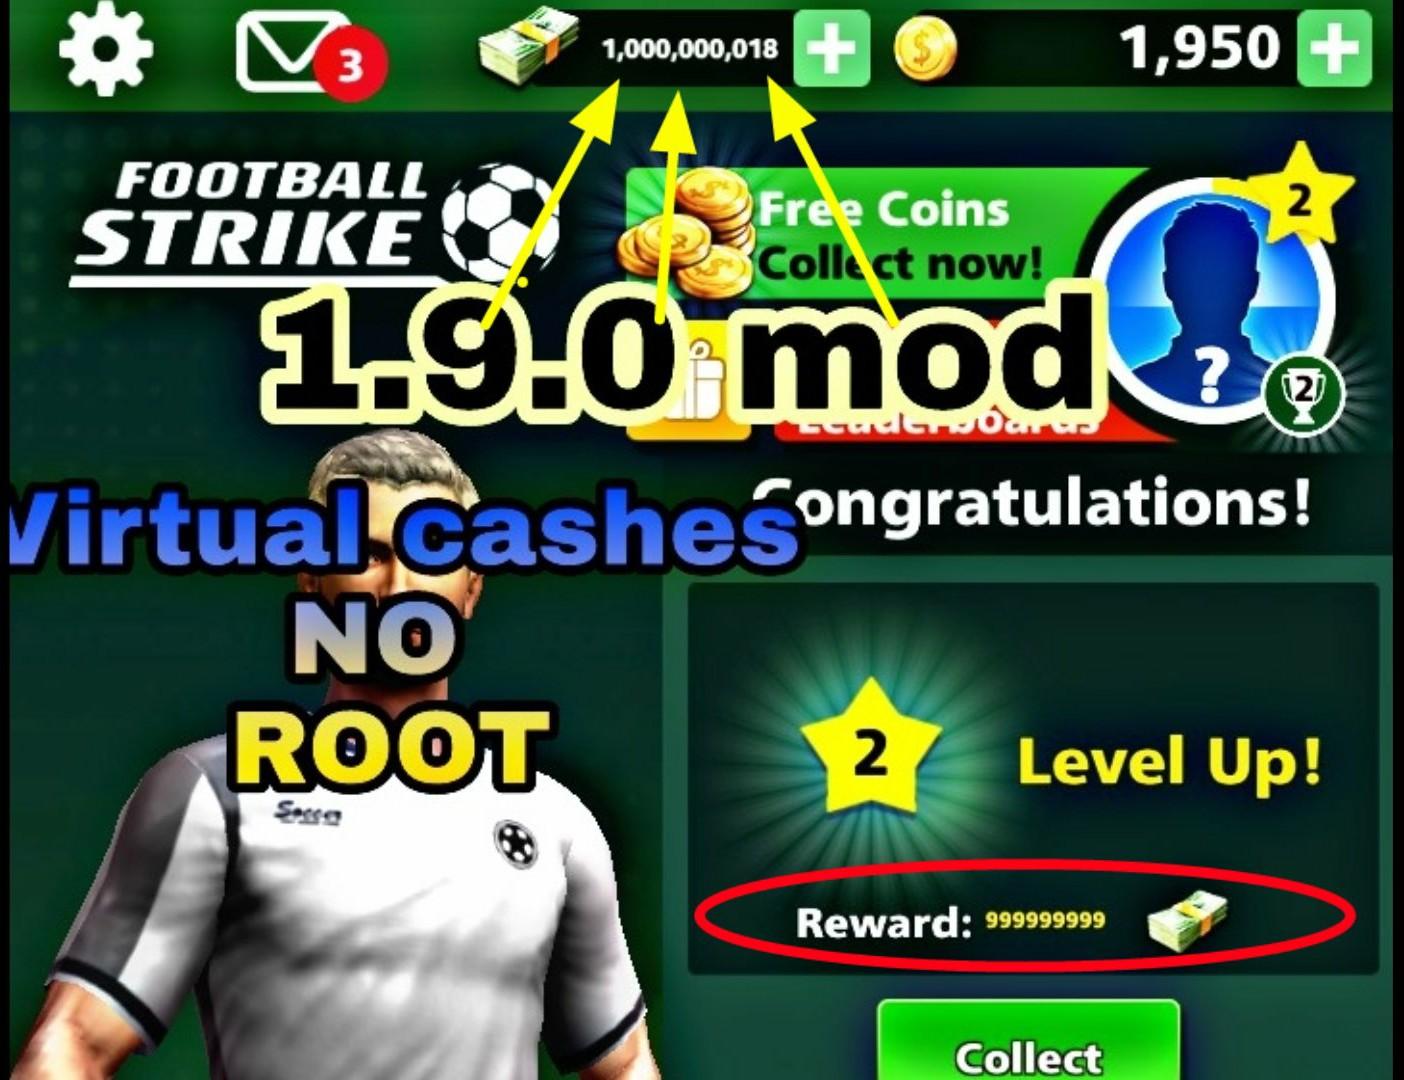 Football Strike 1 9 0 Cash Mod Unlimited Cash Coins